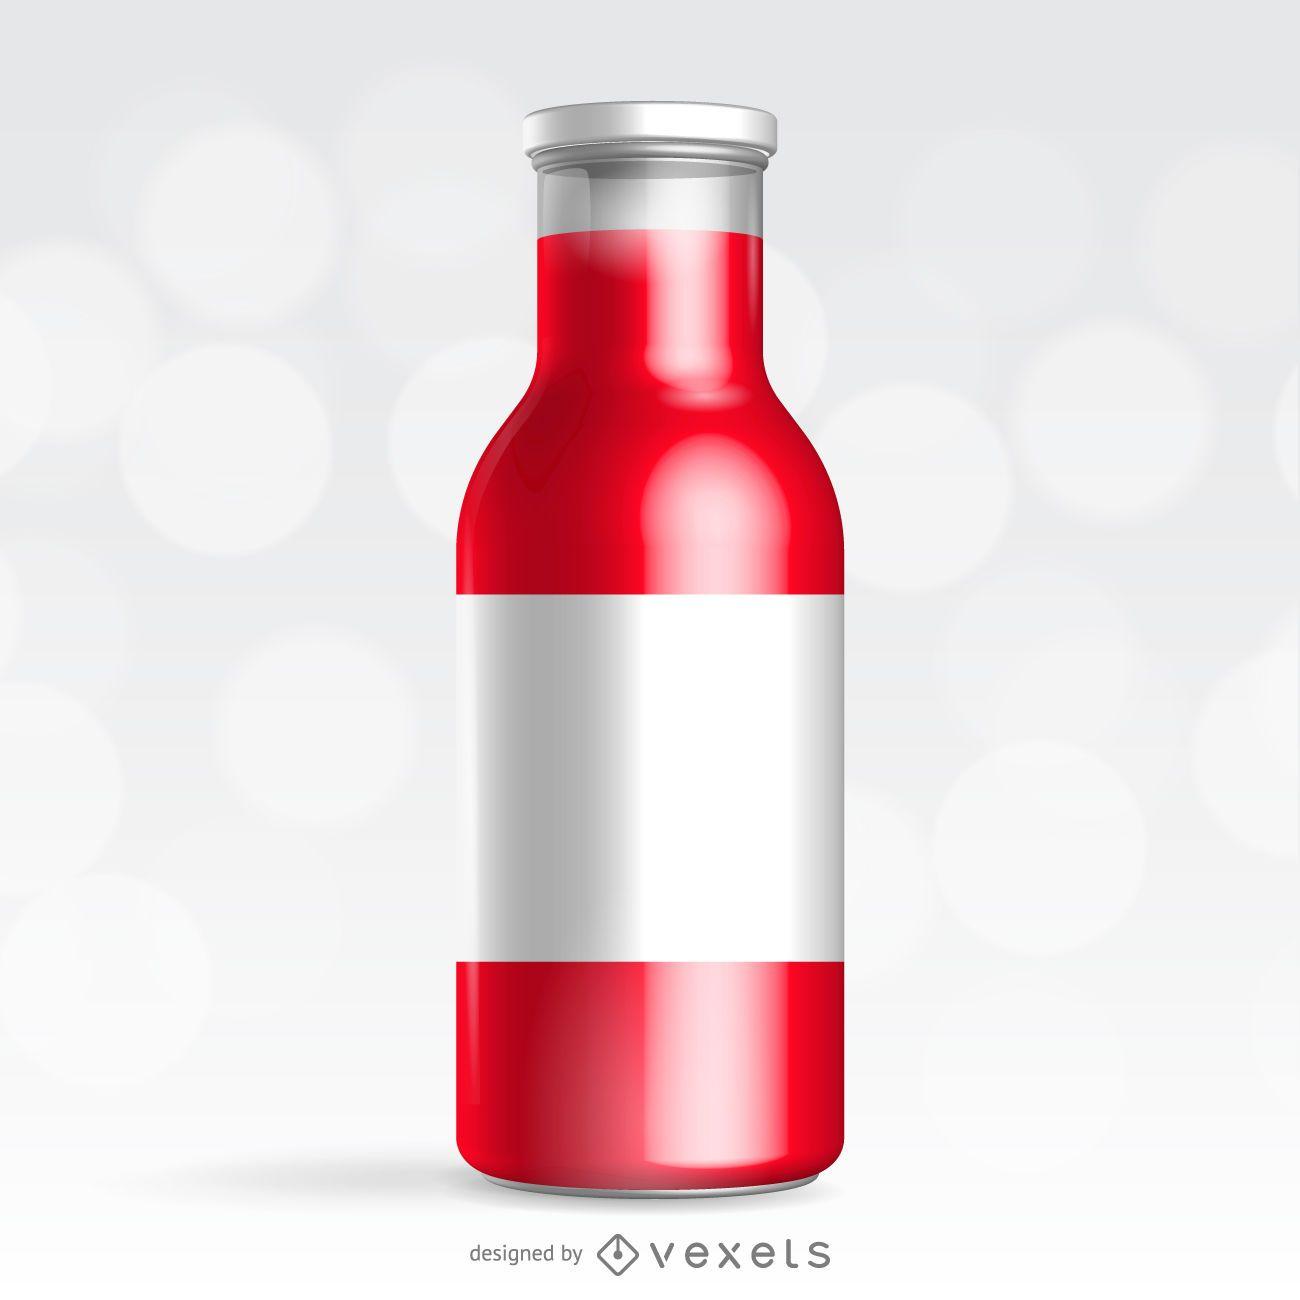 Red bottle packaging design